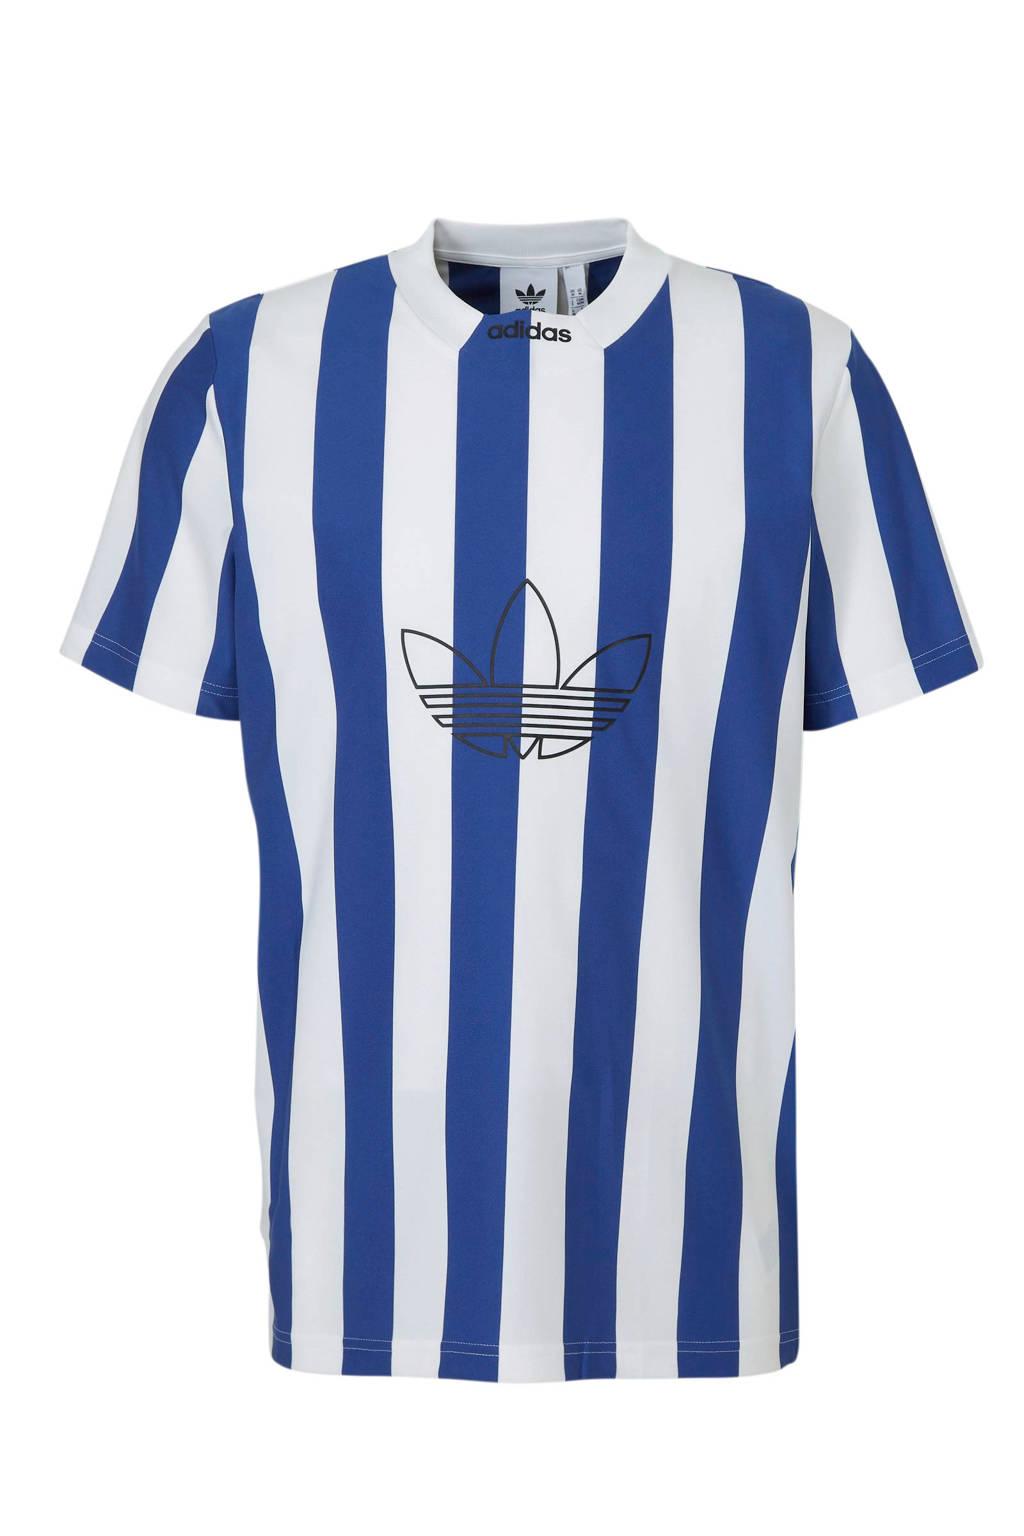 d87dbce0034 adidas originals T-shirt blauw/wit streep, Blauw/wit